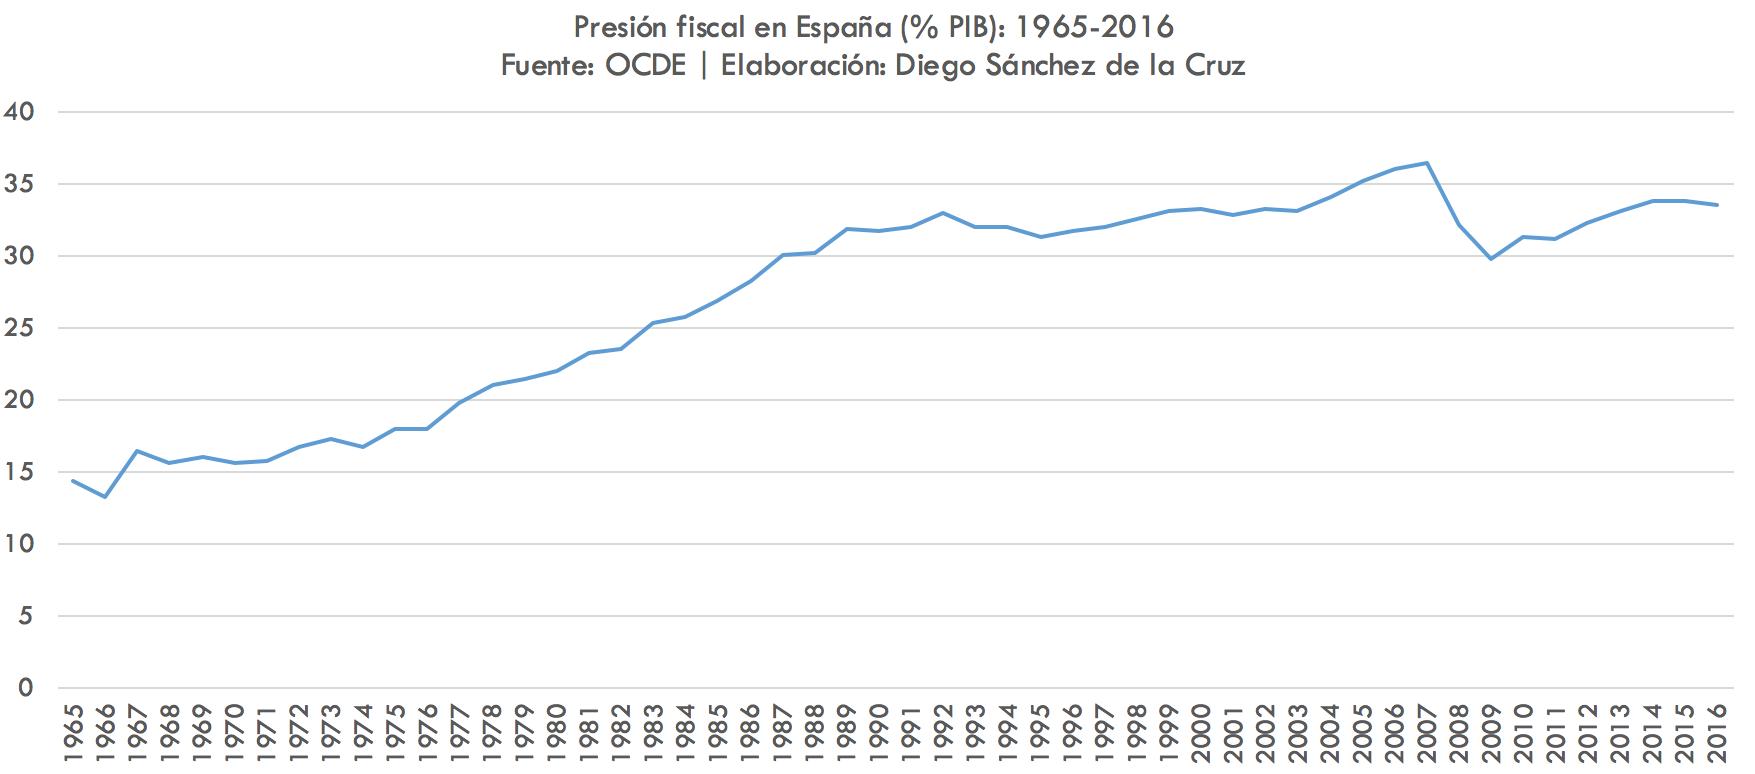 1-Presion-fiscal-Espana-OCDE.png